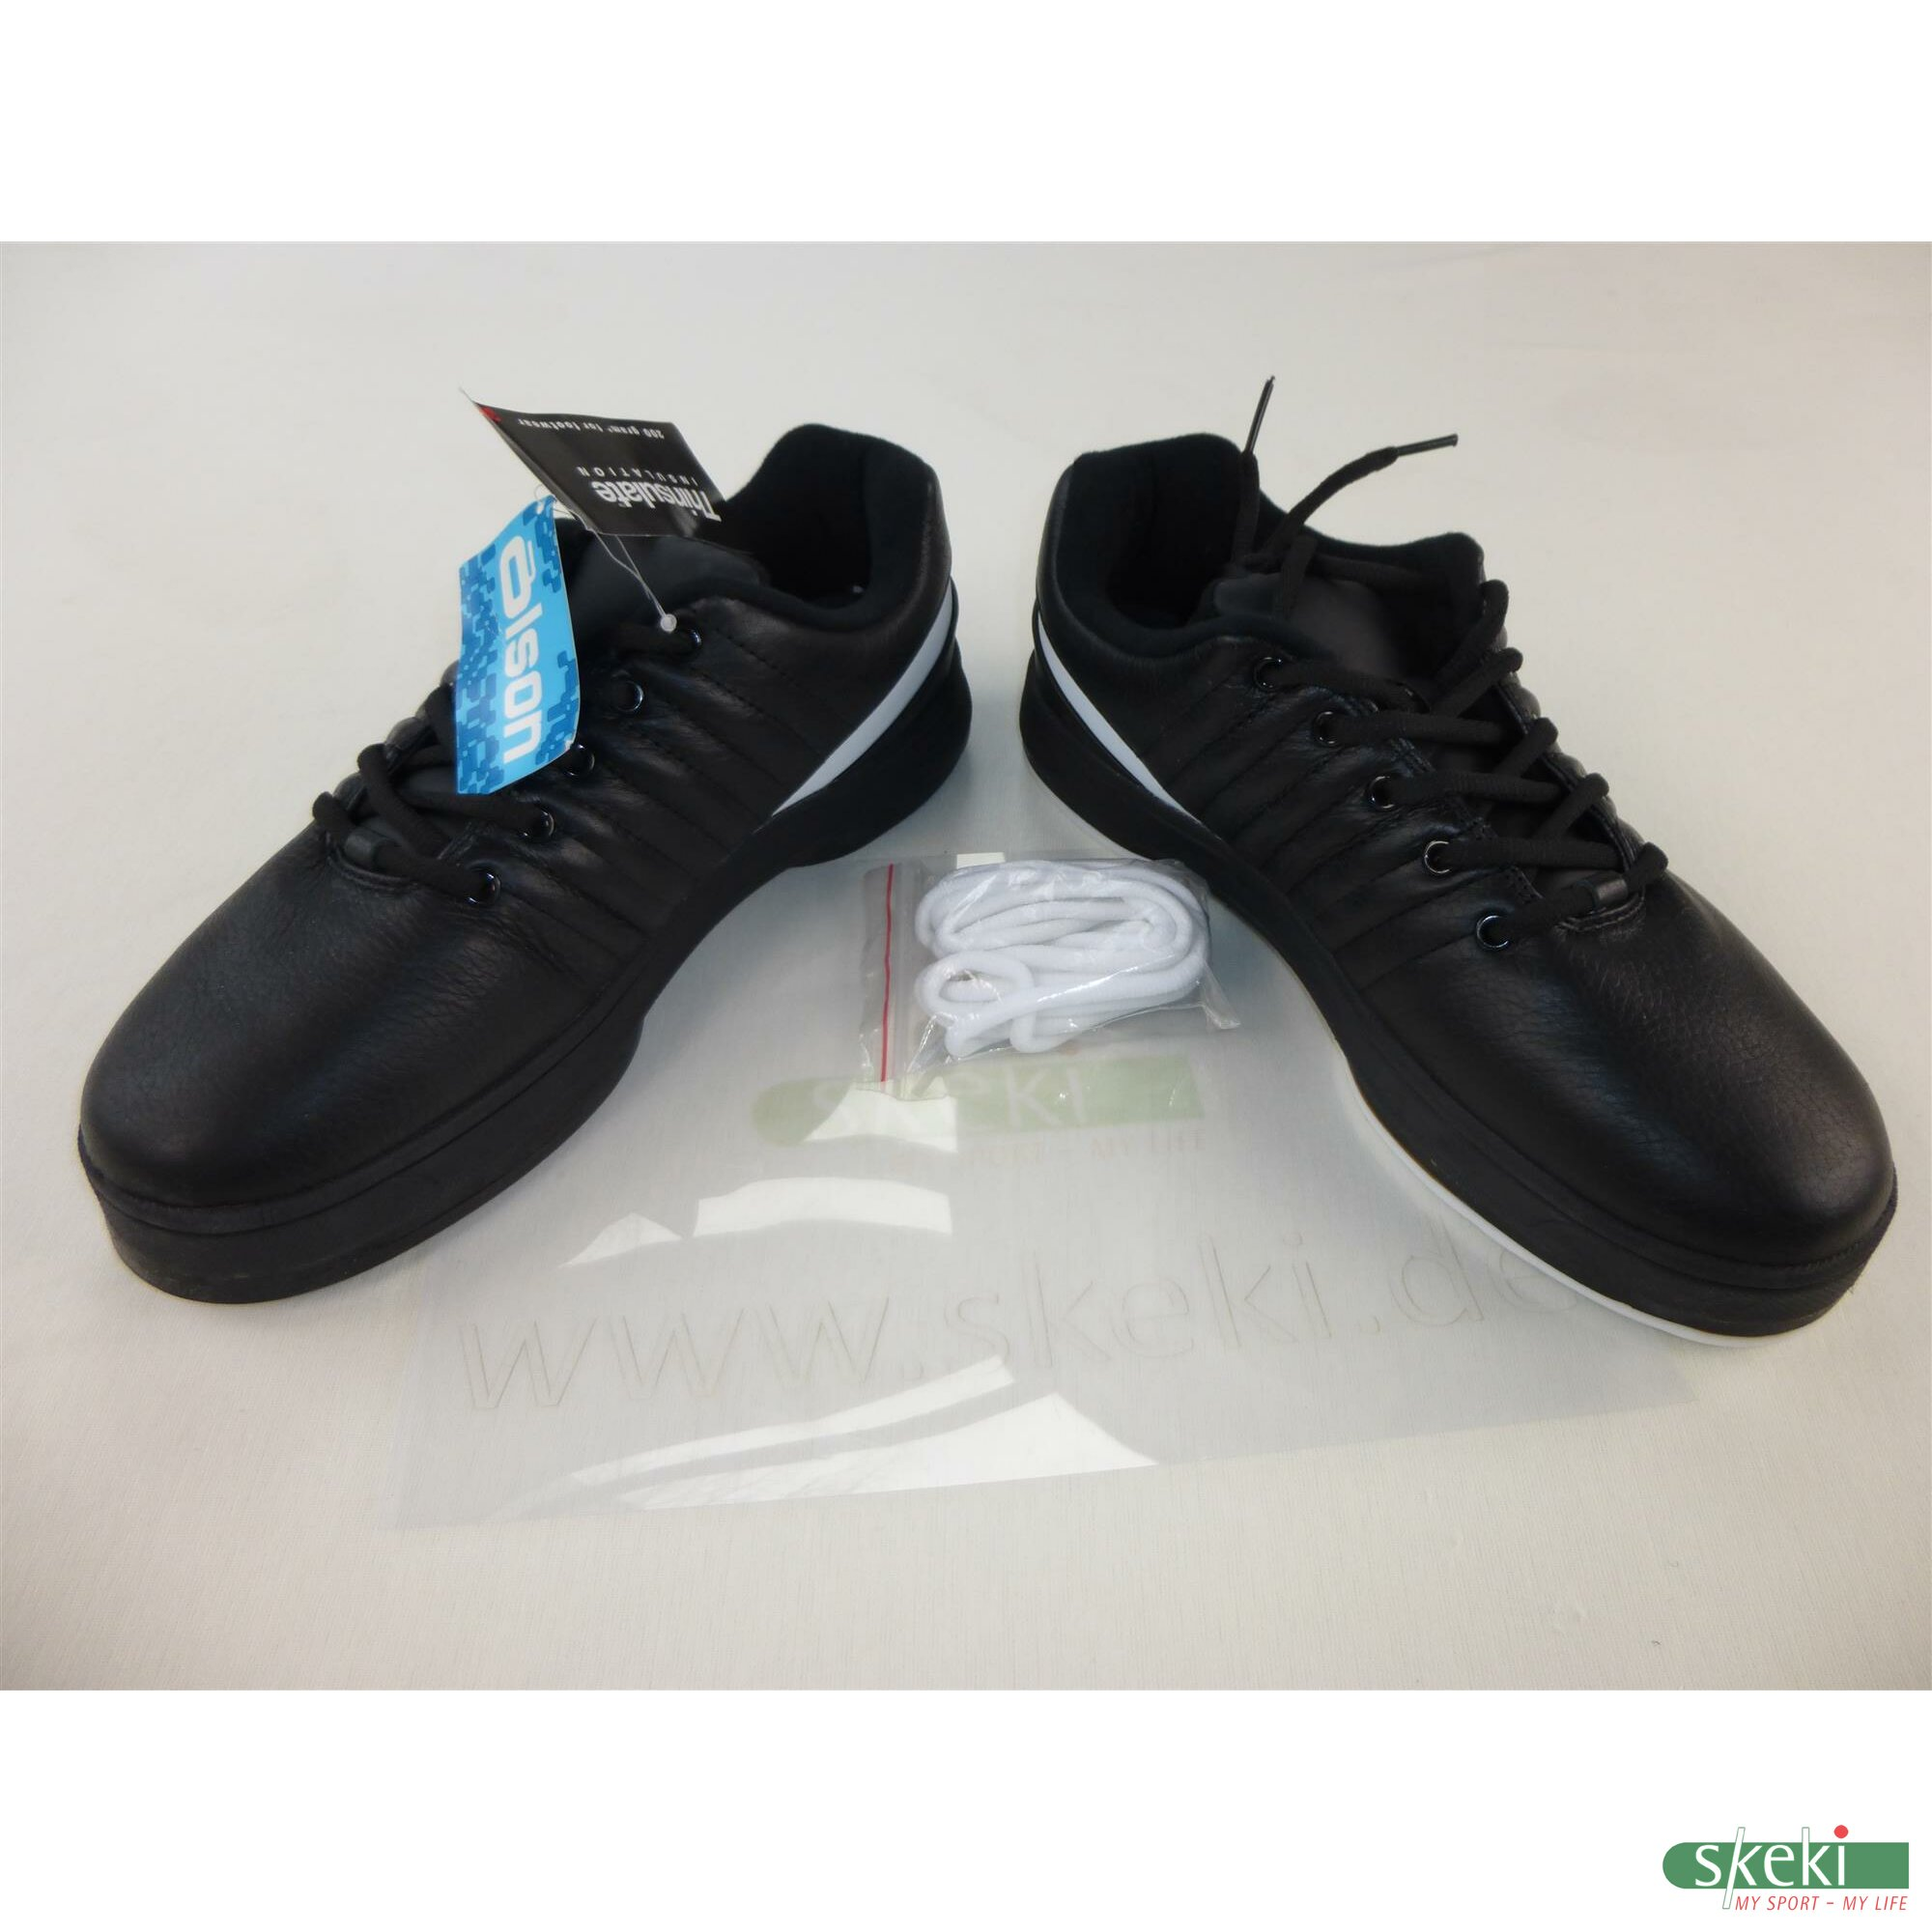 curling shoe classic skeki de